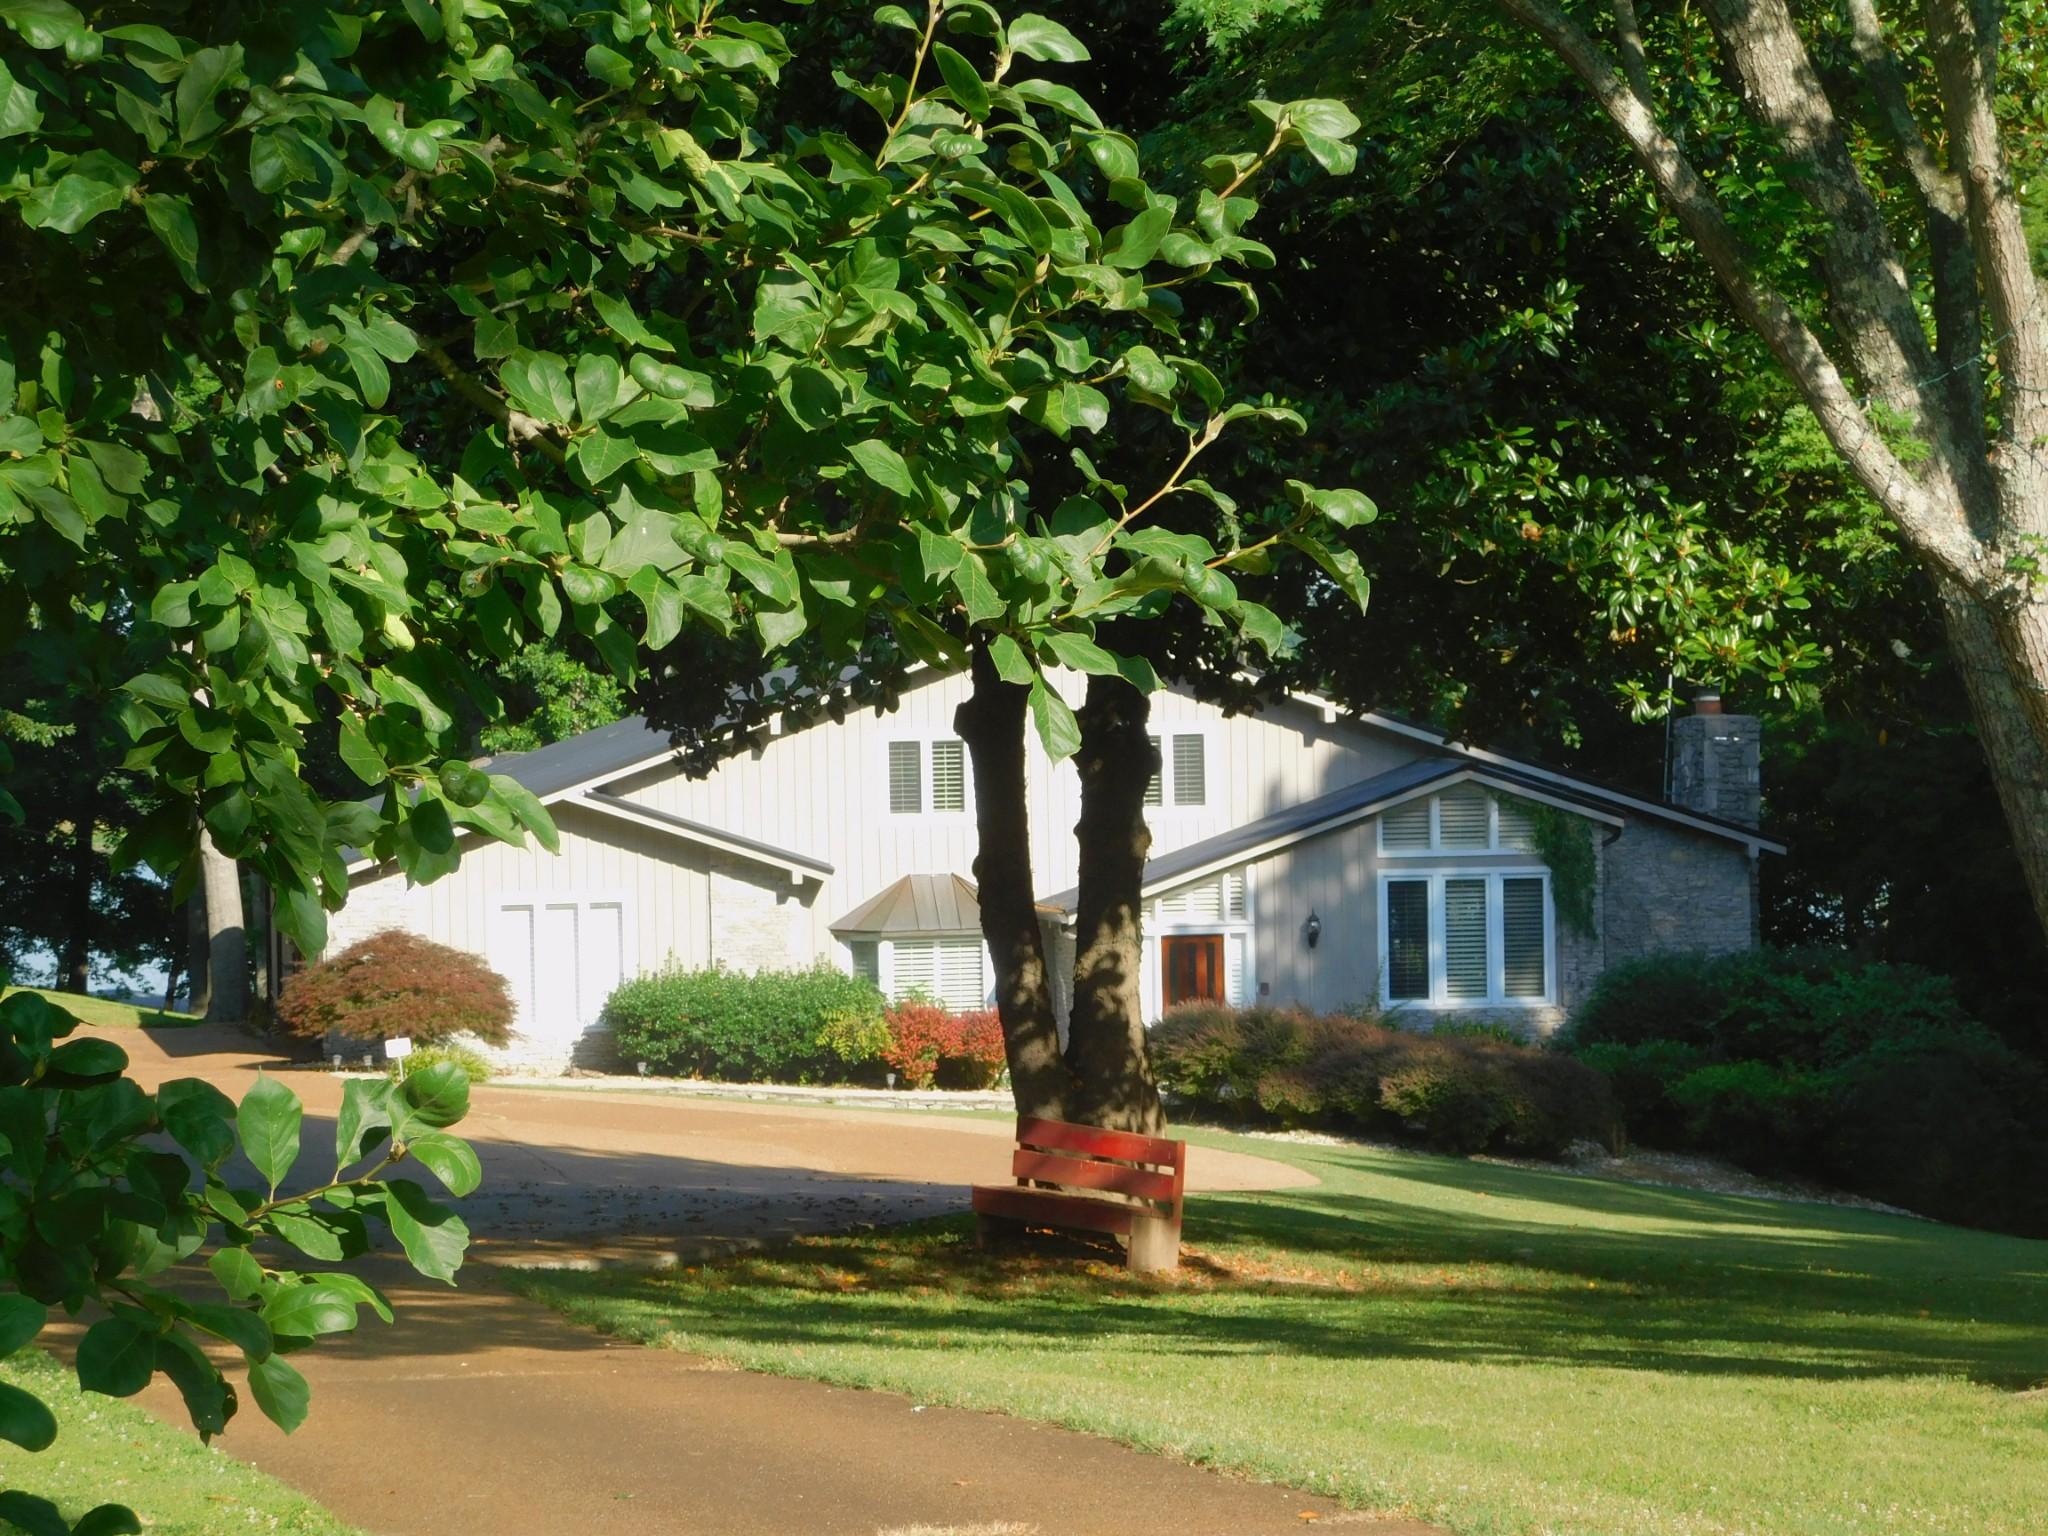 1264 Lock 4 Rd, Gallatin, TN 37066 - Gallatin, TN real estate listing